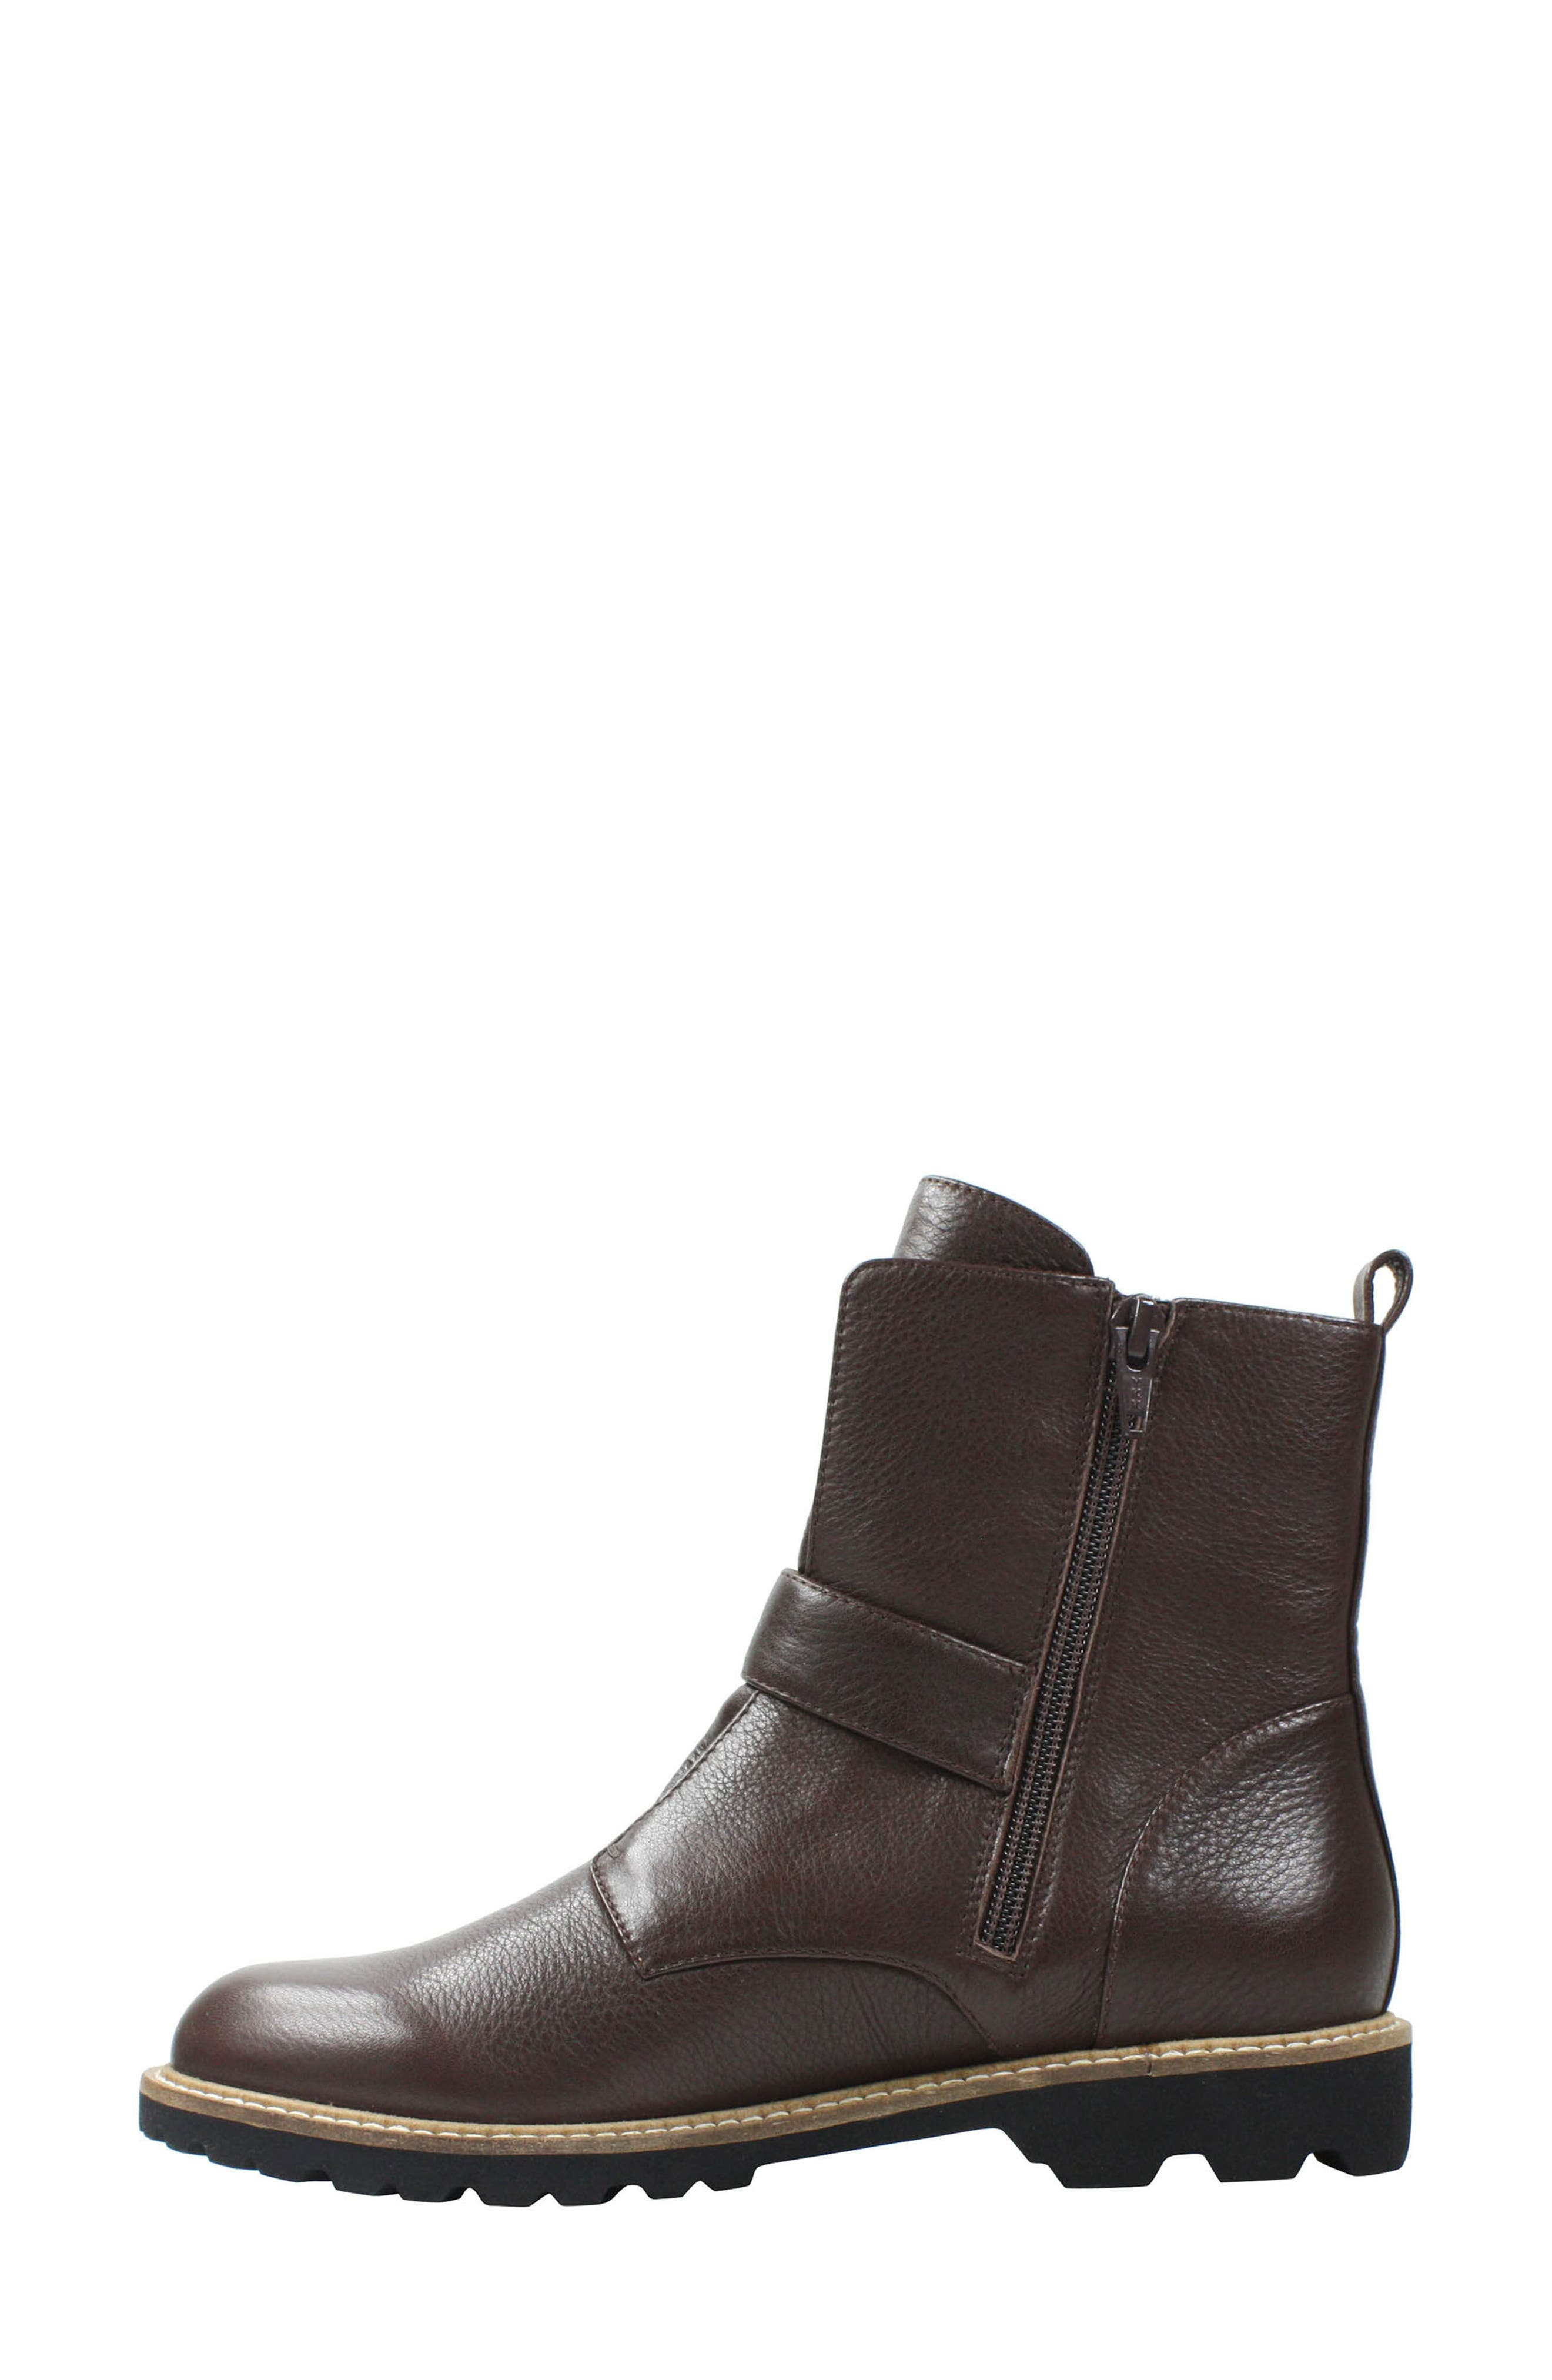 Rapolano Boot,                             Alternate thumbnail 2, color,                             Moro Leather